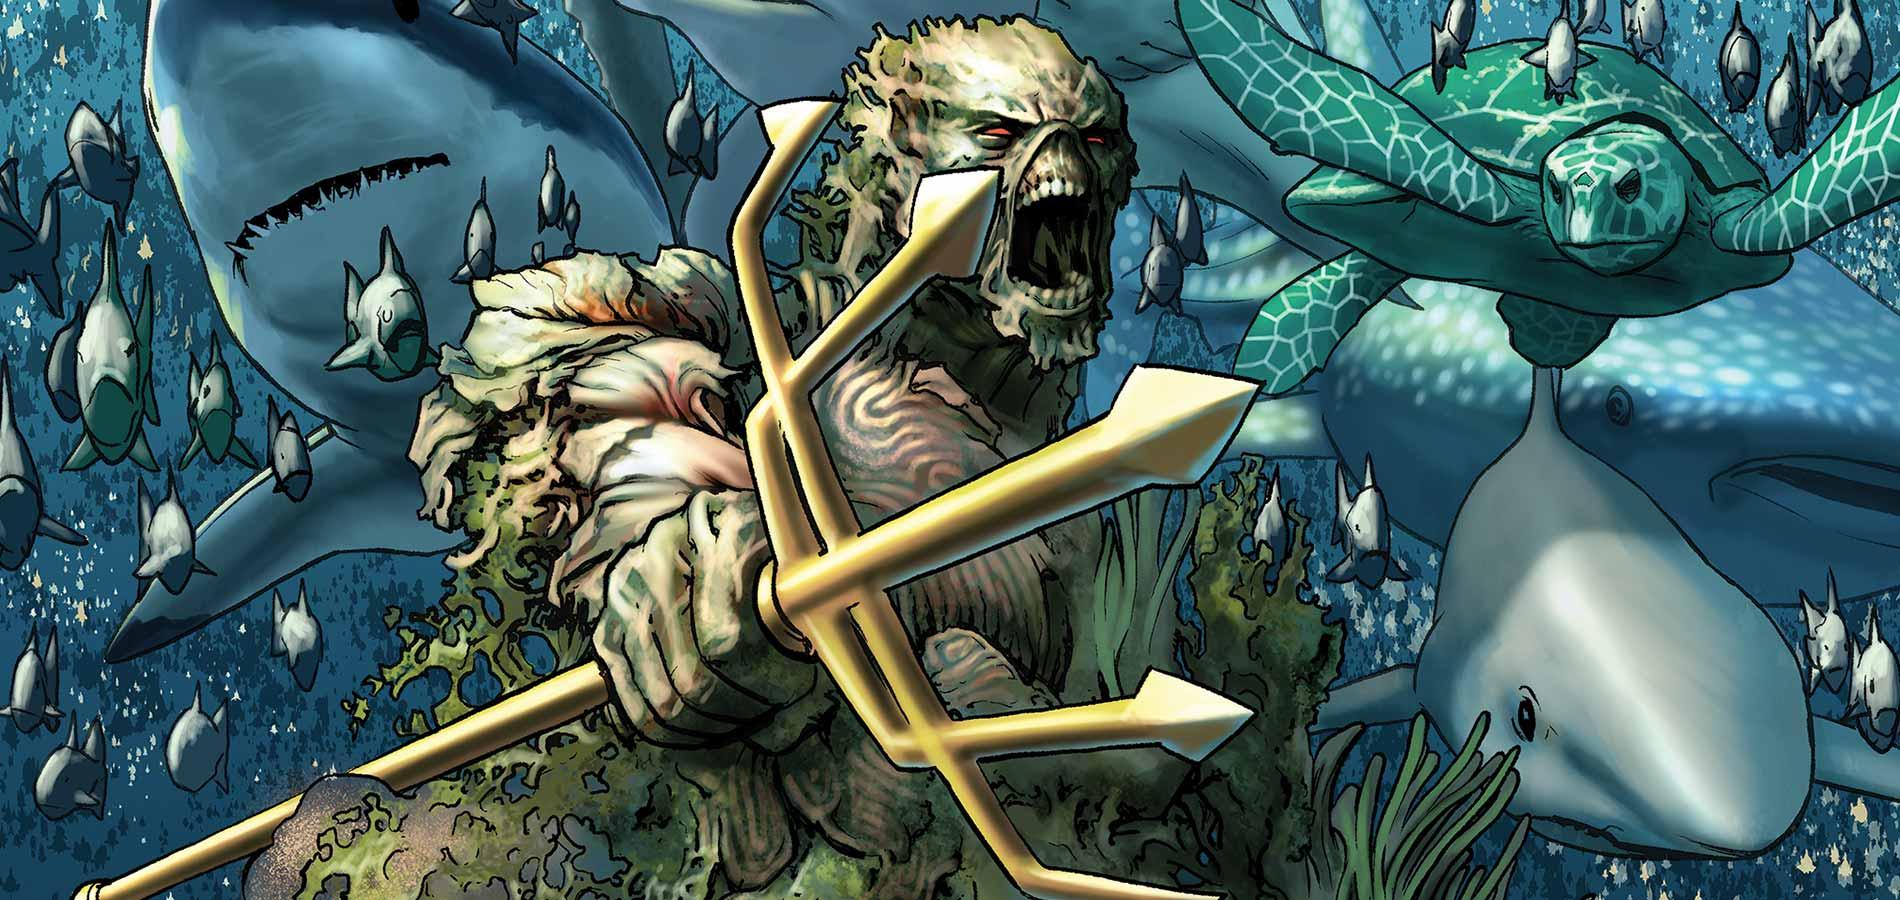 Aquaman Tome 4 - Swamp Thing #32